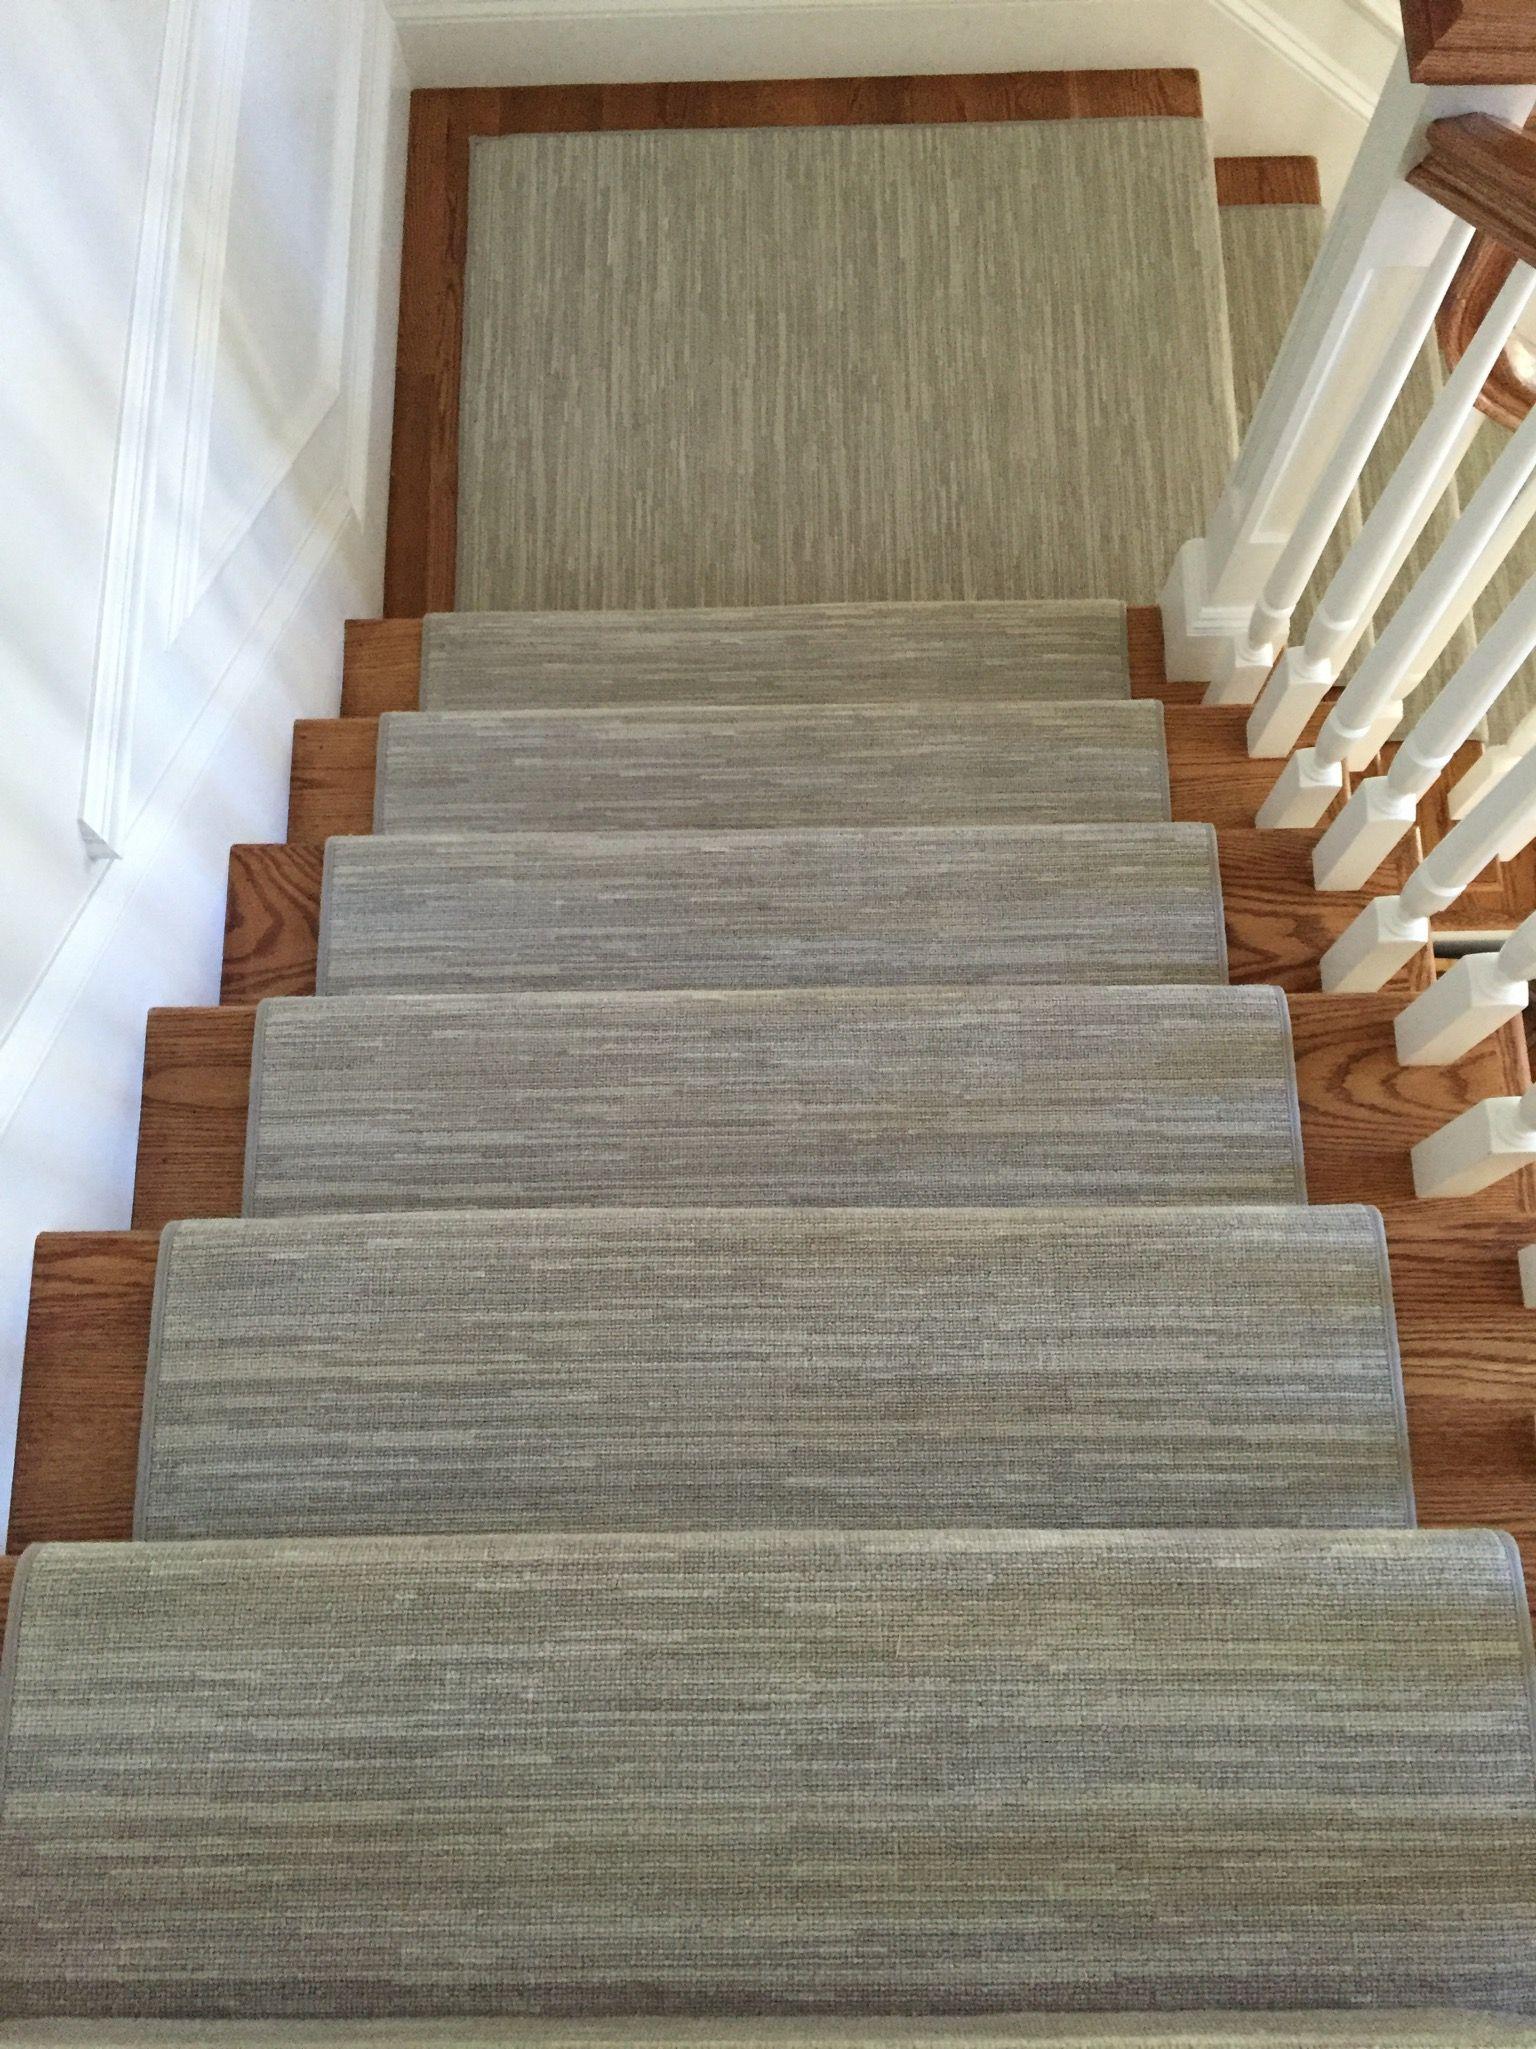 This Stair Runner Is Nourison Hagaman New Horizon Stair Runner | Home Depot Stair Runners | Diy | Boards | Half Landing | Outdoor | Tread